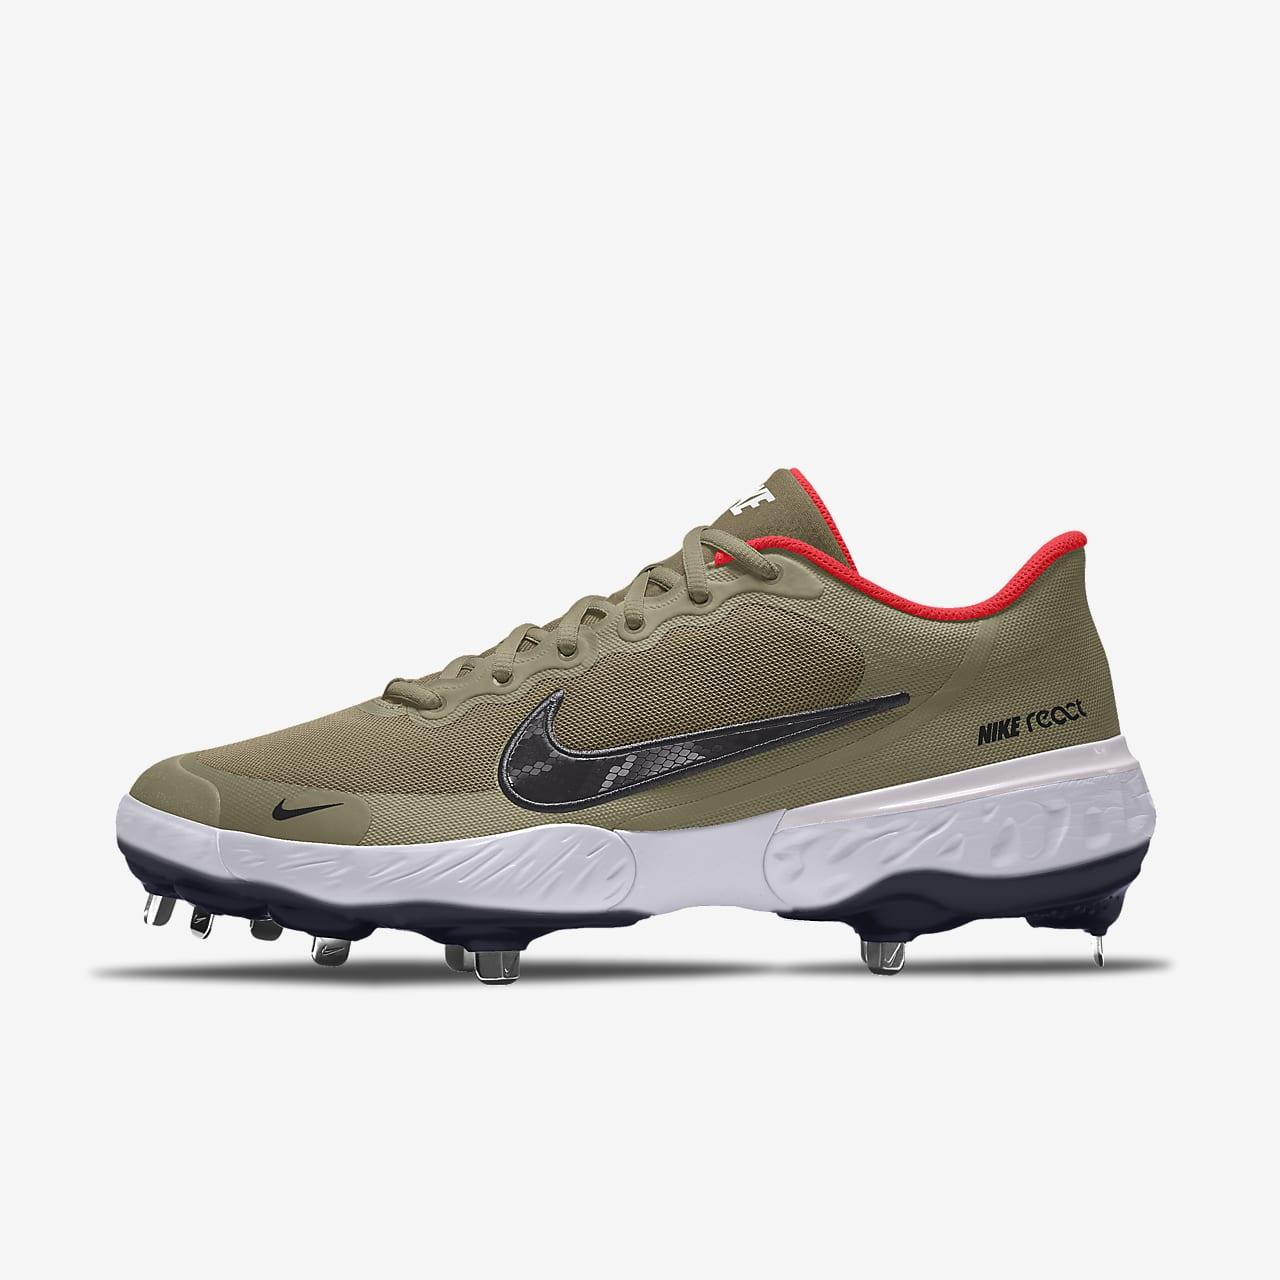 Scarpa da baseball personalizzabile Nike Alpha Huarache Elite 3 Low By You